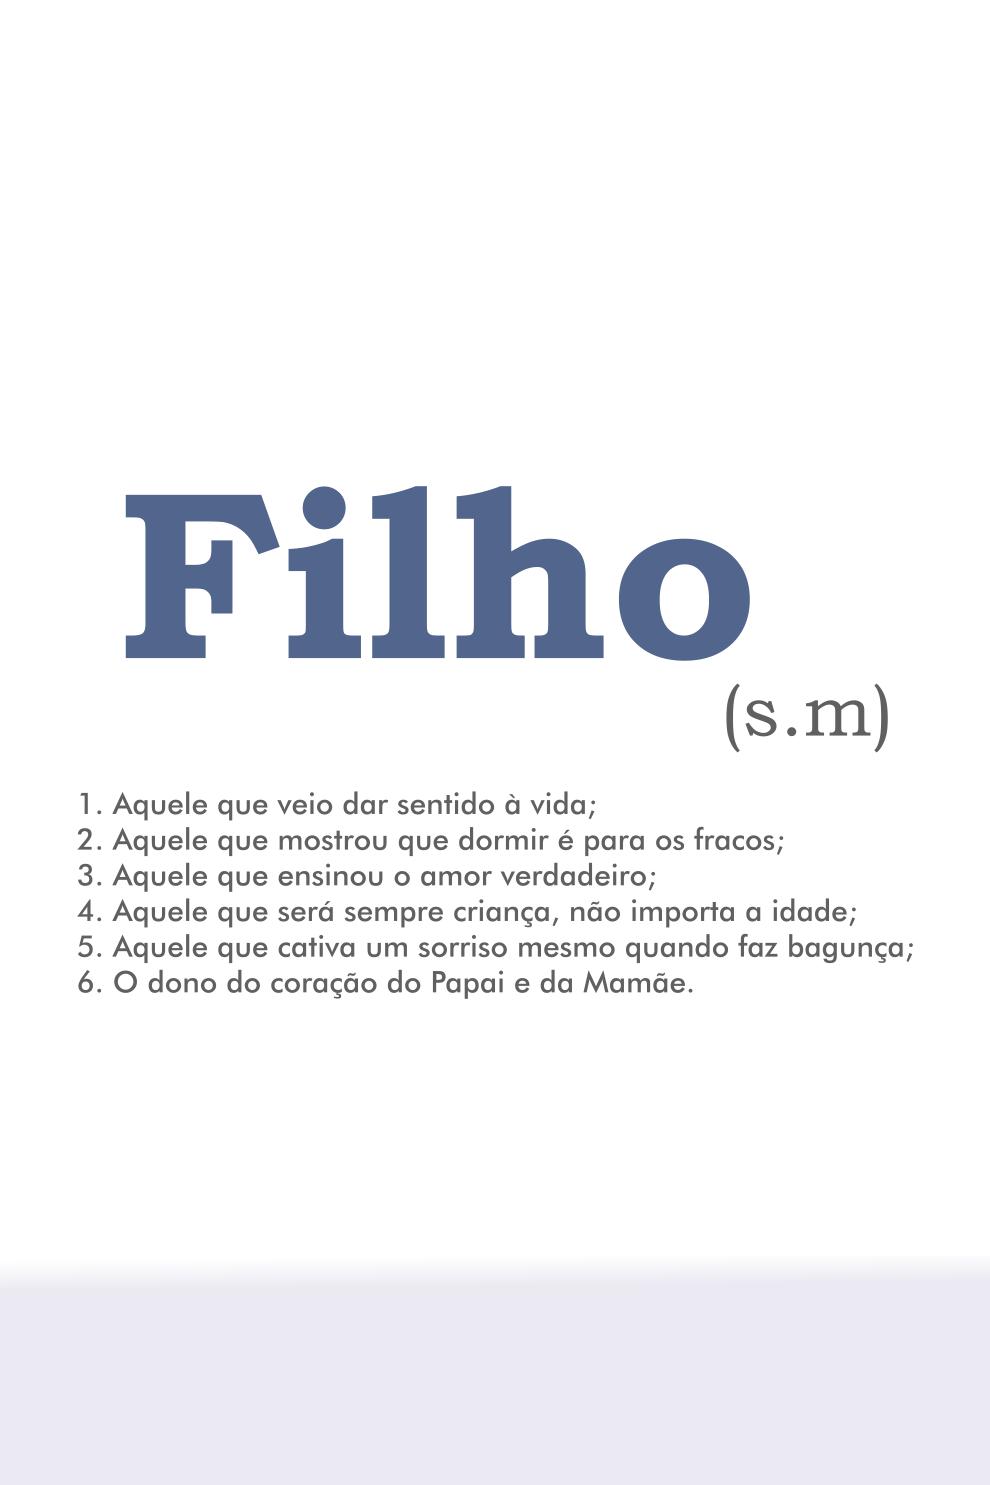 001/F - Pijama Adulto Masculino Xadrez Família Completa Estampa Filho